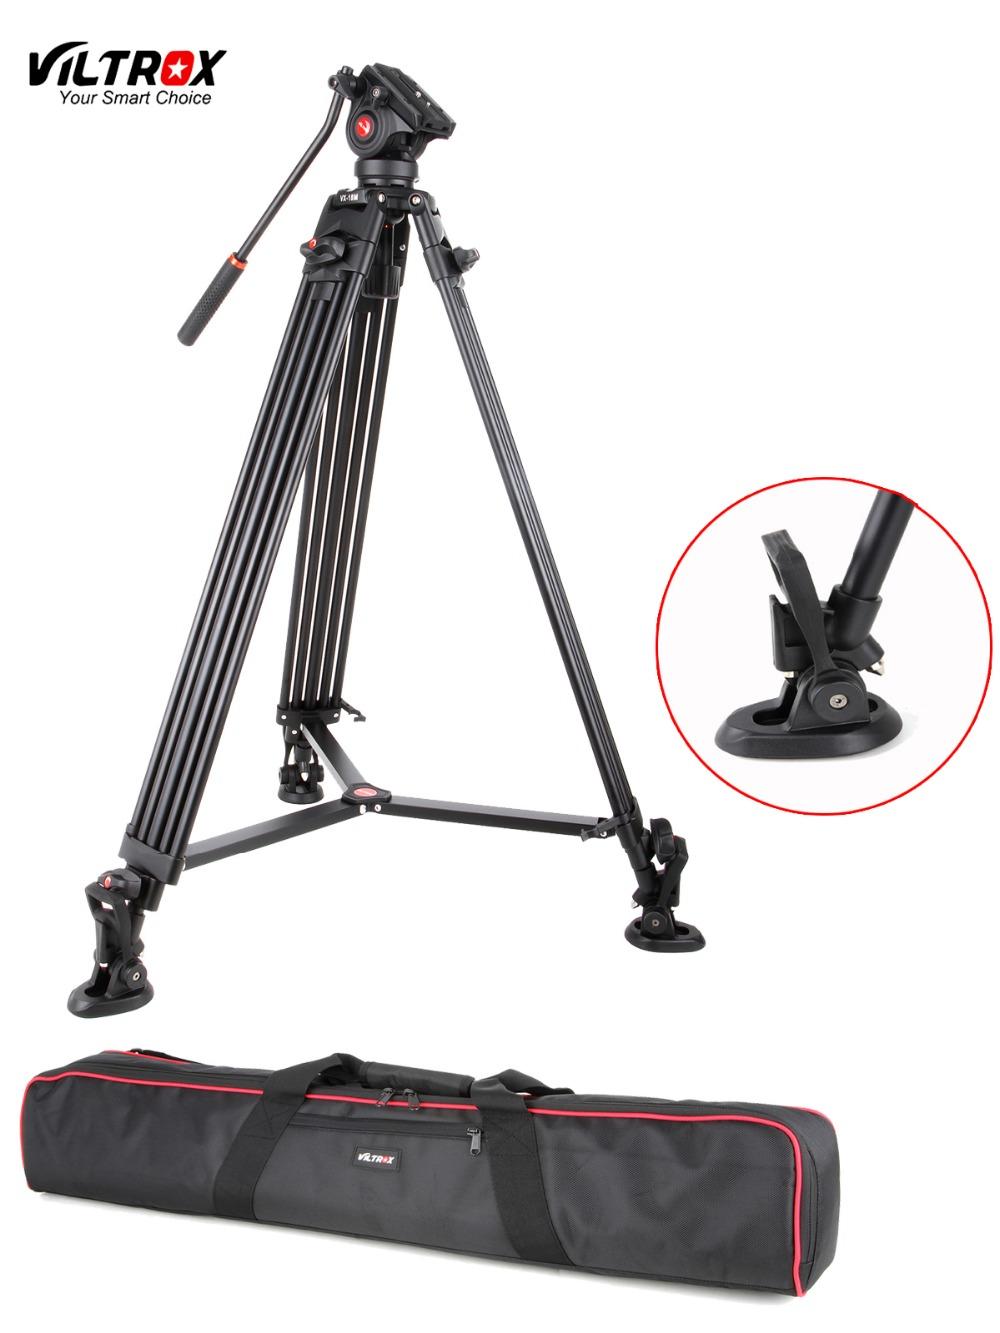 1.8M Viltrox VX-18M Pro Heay Duty Aluminum Video Tripod + Fluid Pan Head + Carry Bag for Camera DV DSLR Very Stable(China (Mainland))